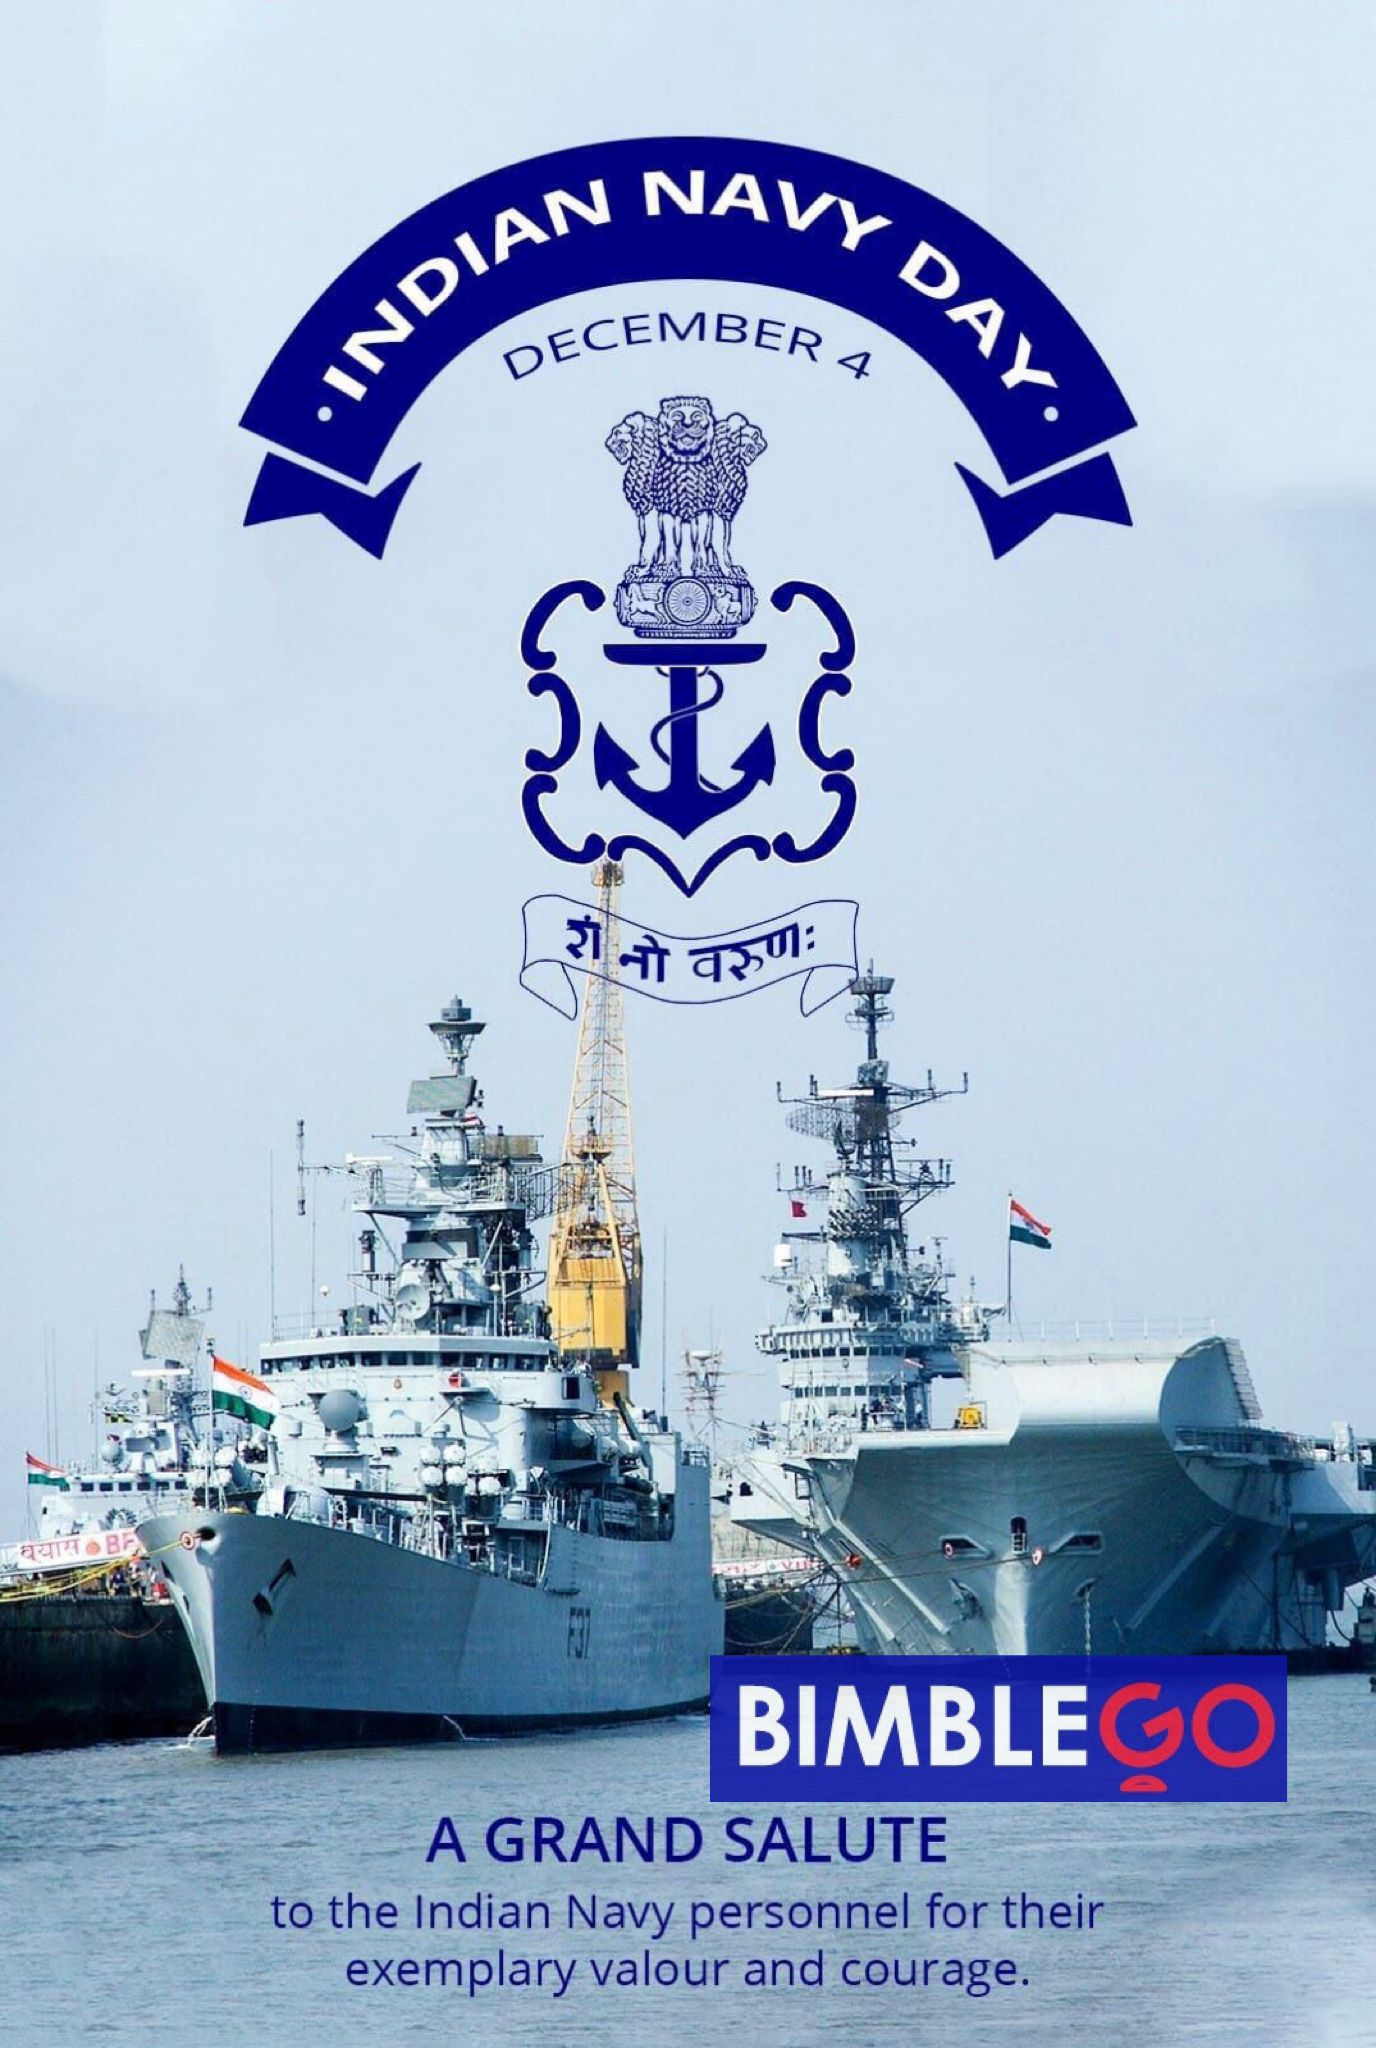 Bimblego Bimblegoconsultants Immigration Studyabroad Overseaseducation Higherstudies Study Studyoverseas College Navy Day Indian Navy Day Indian Navy